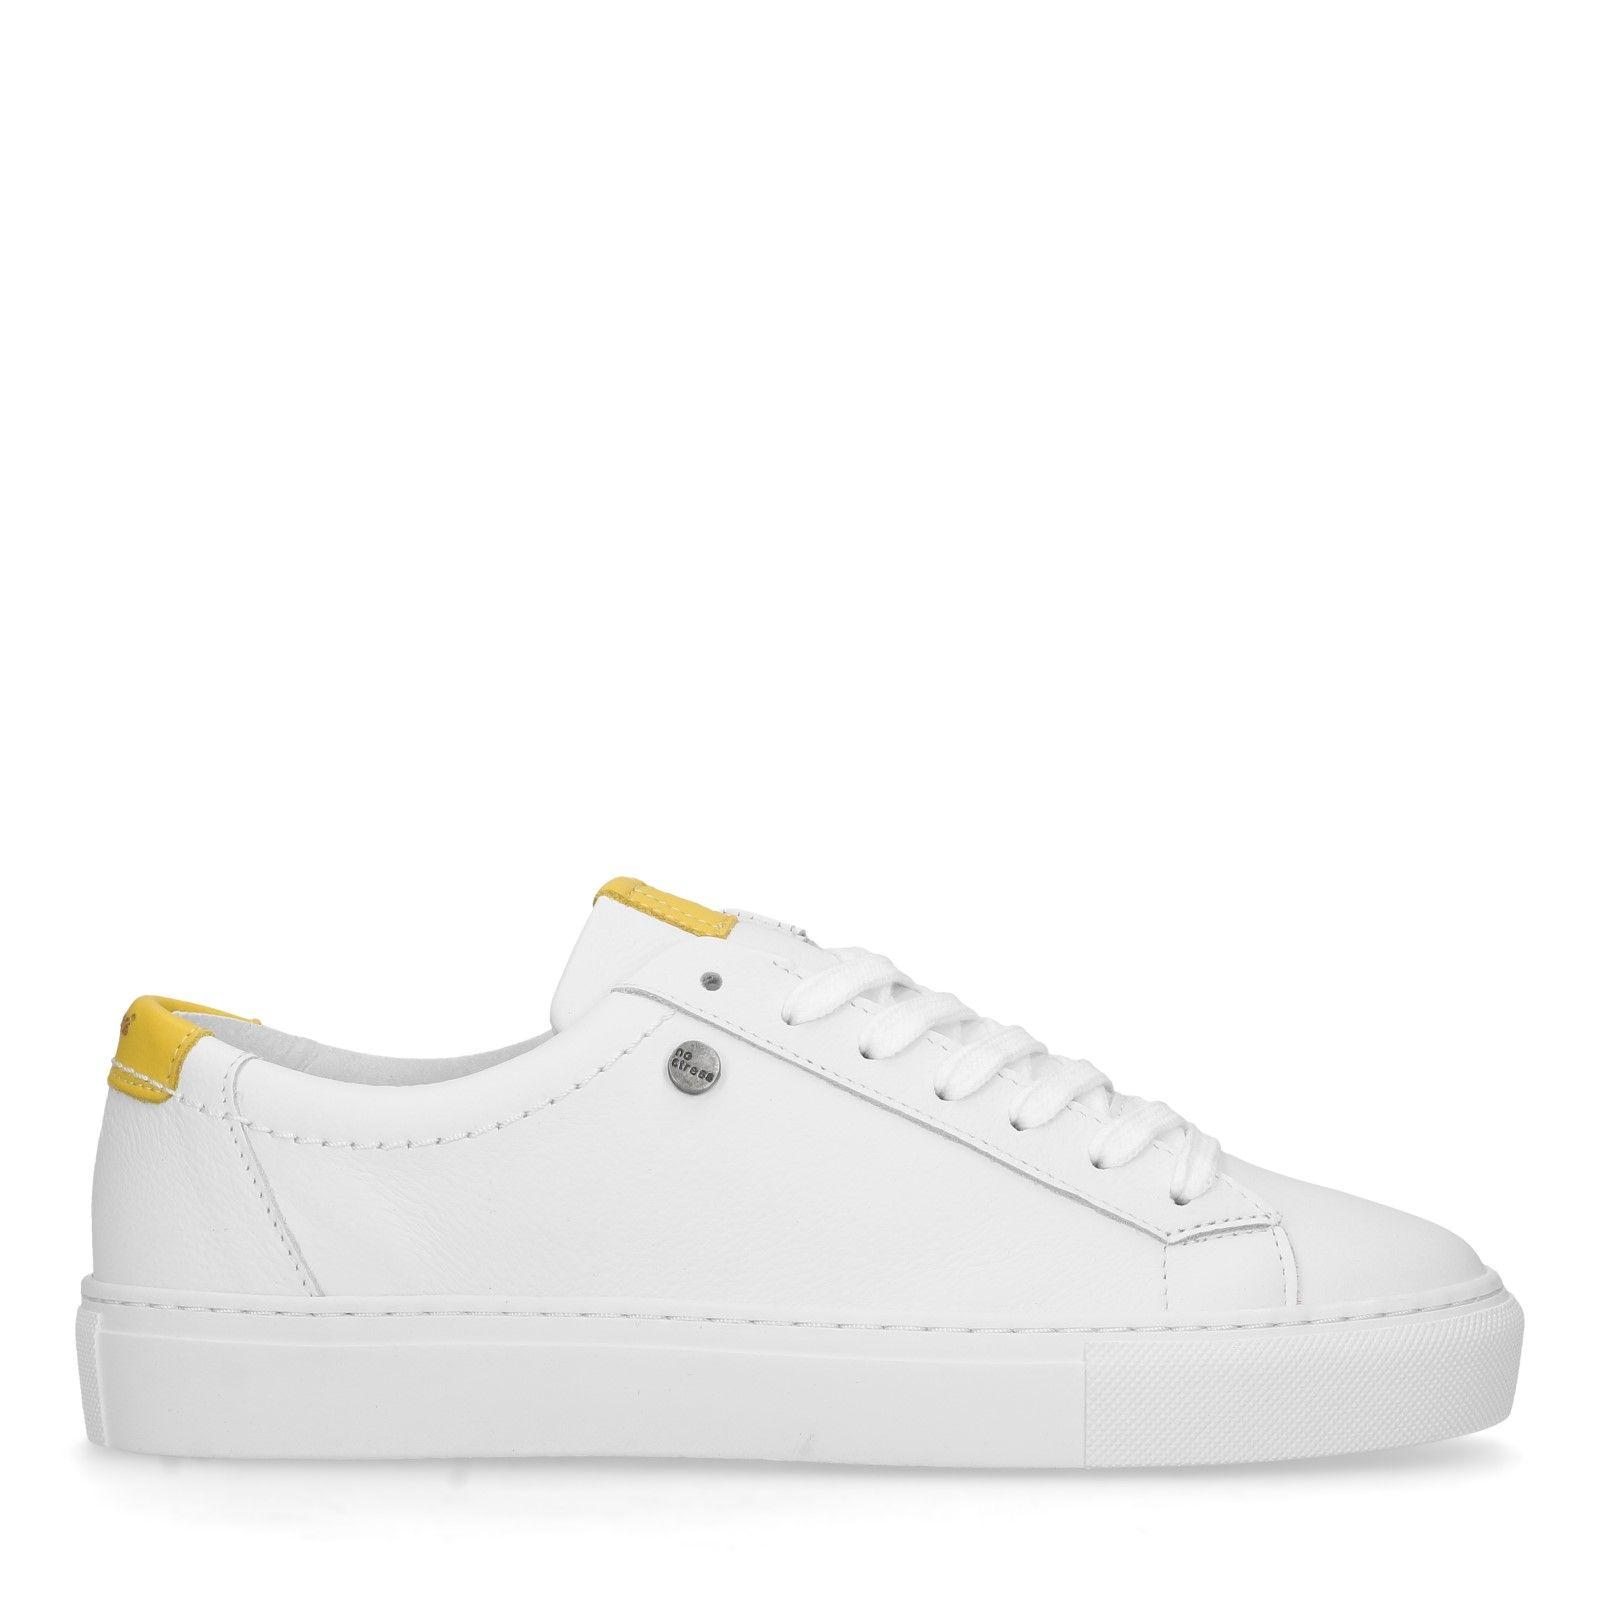 arrives 41558 e4431 Weiße Leder-Sneaker